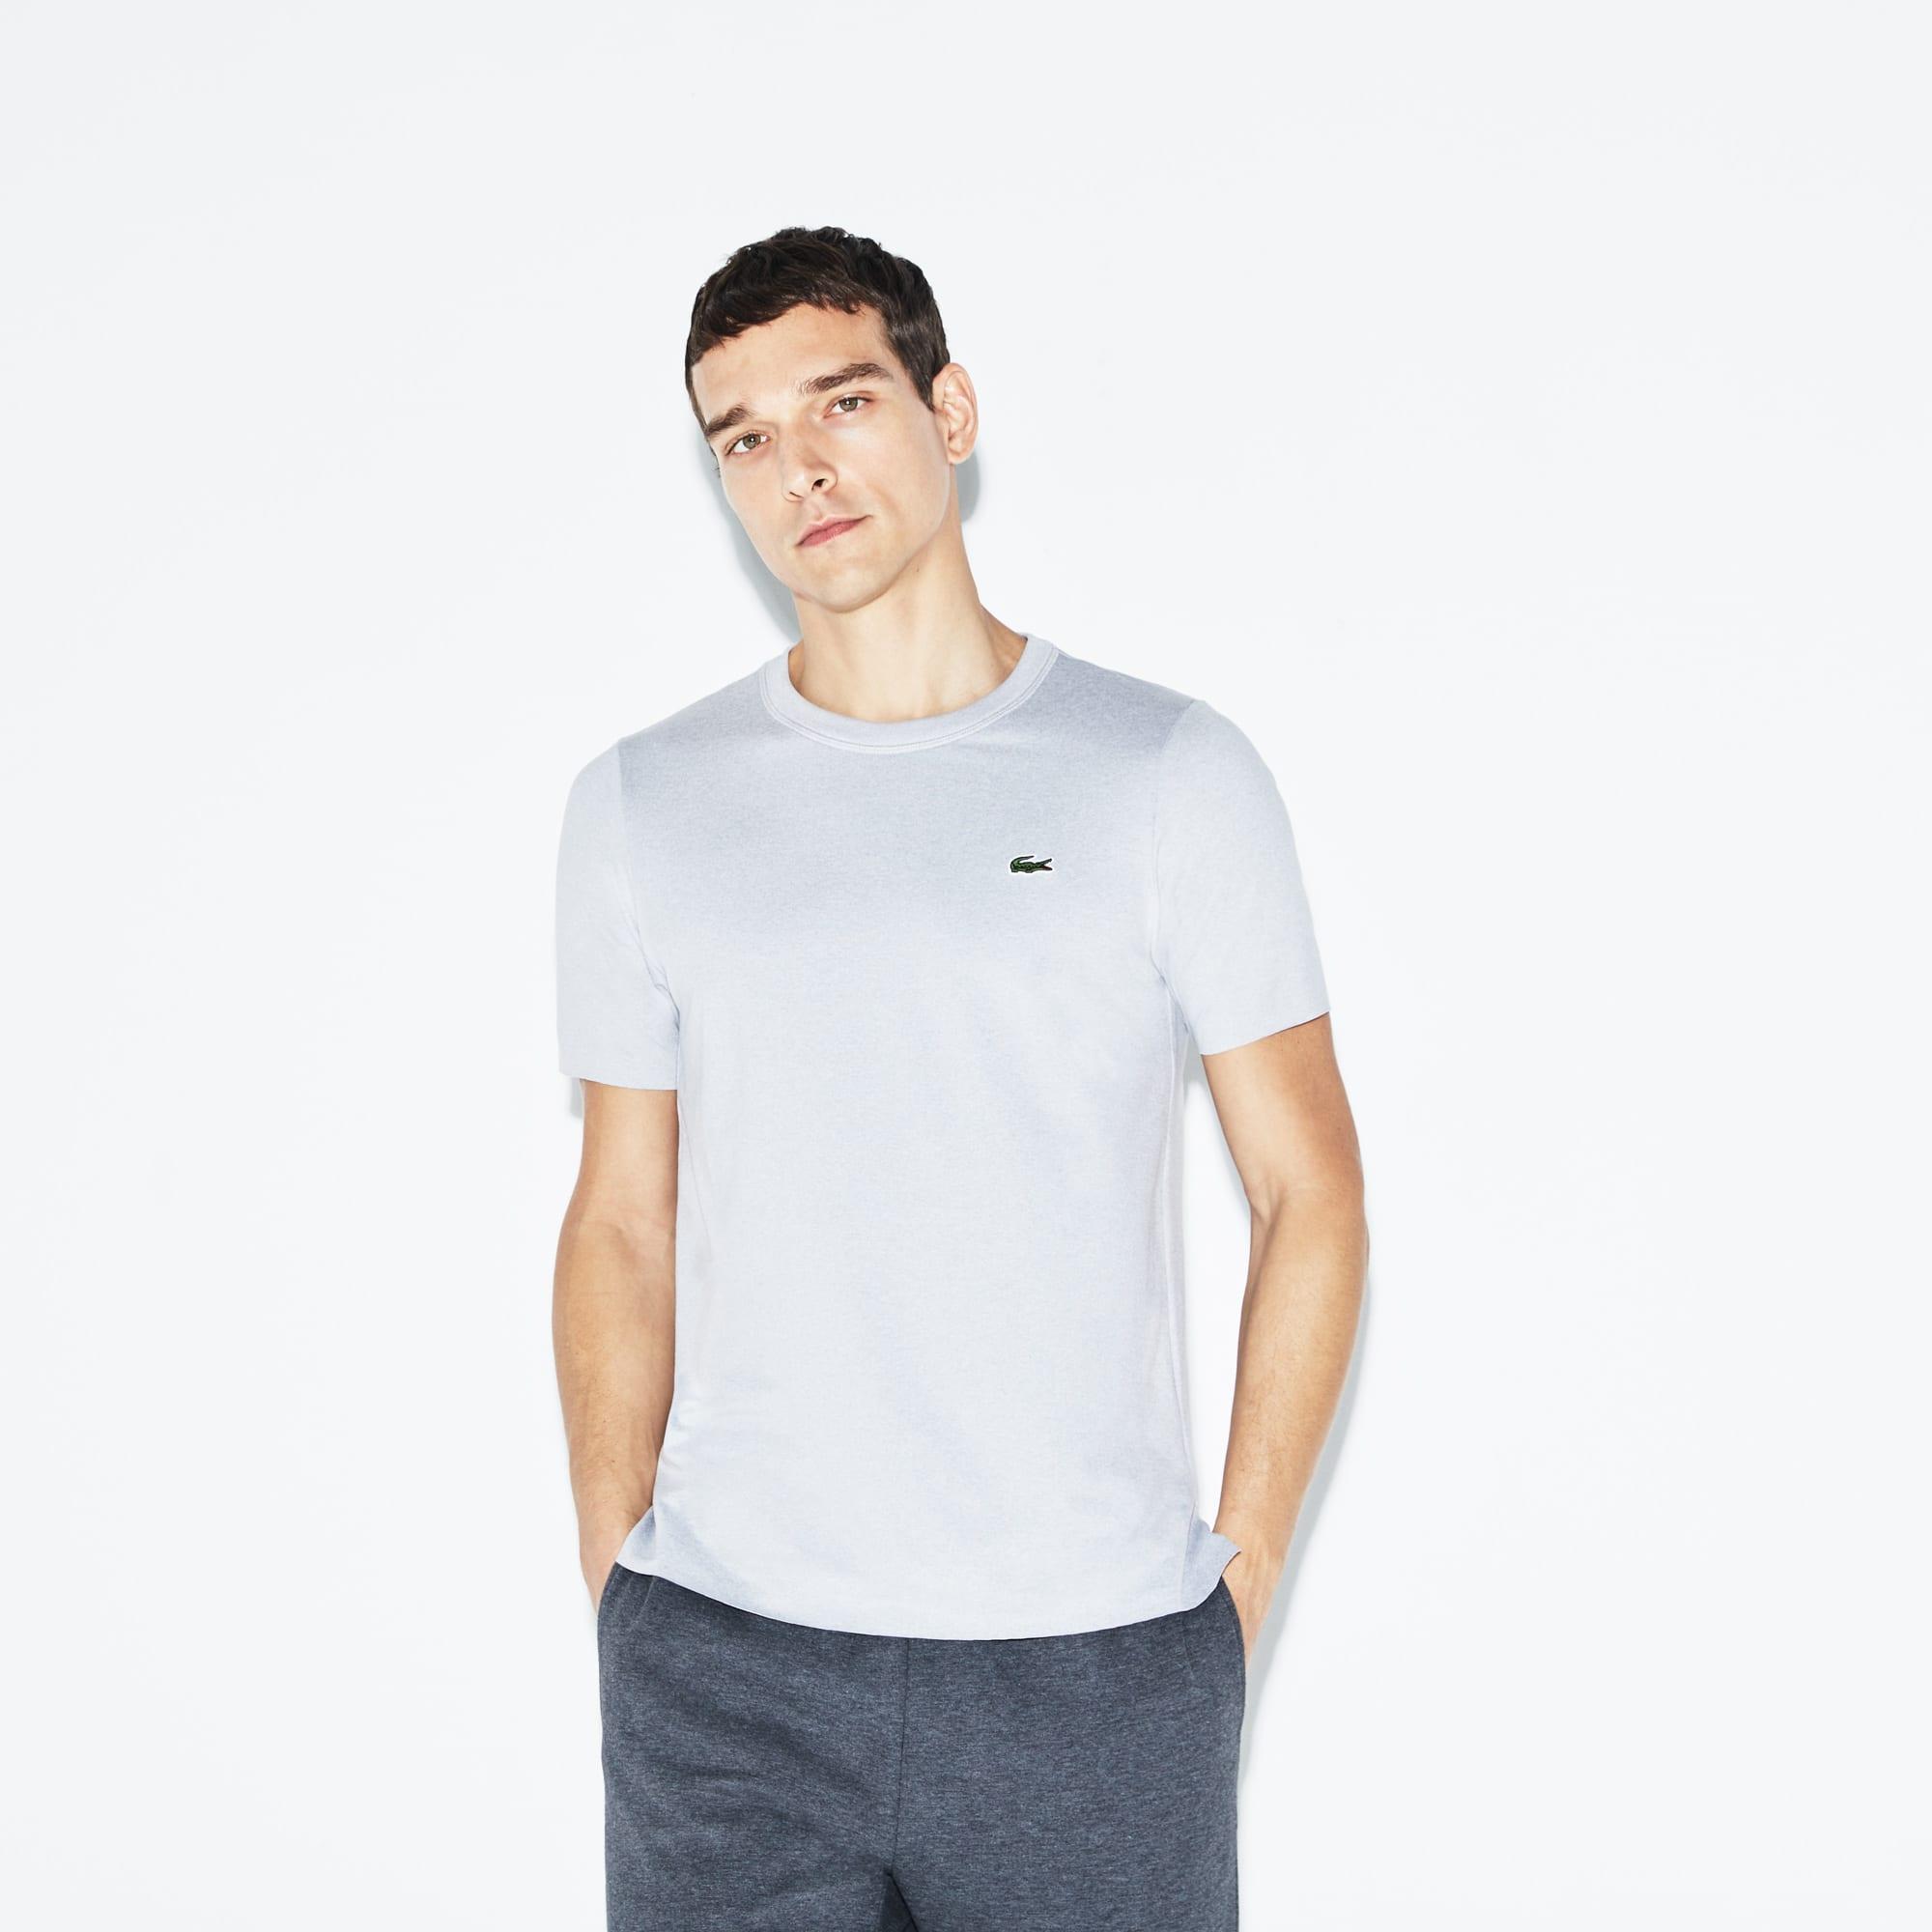 Men's SPORT Flecked Stretch Tennis T-Shirt